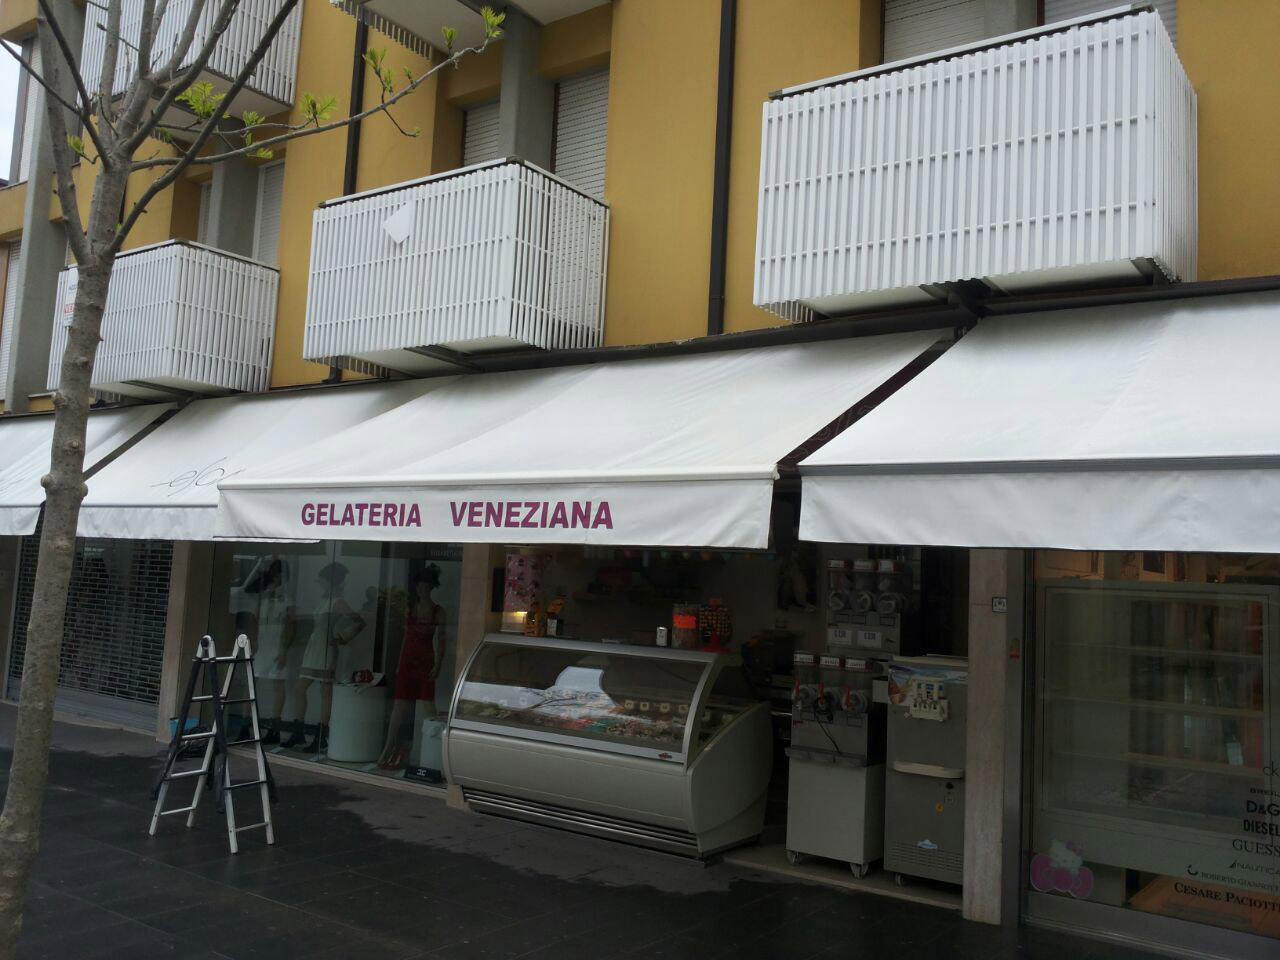 Gelateria Veneziana Lignano Udine Lavaggio Tende